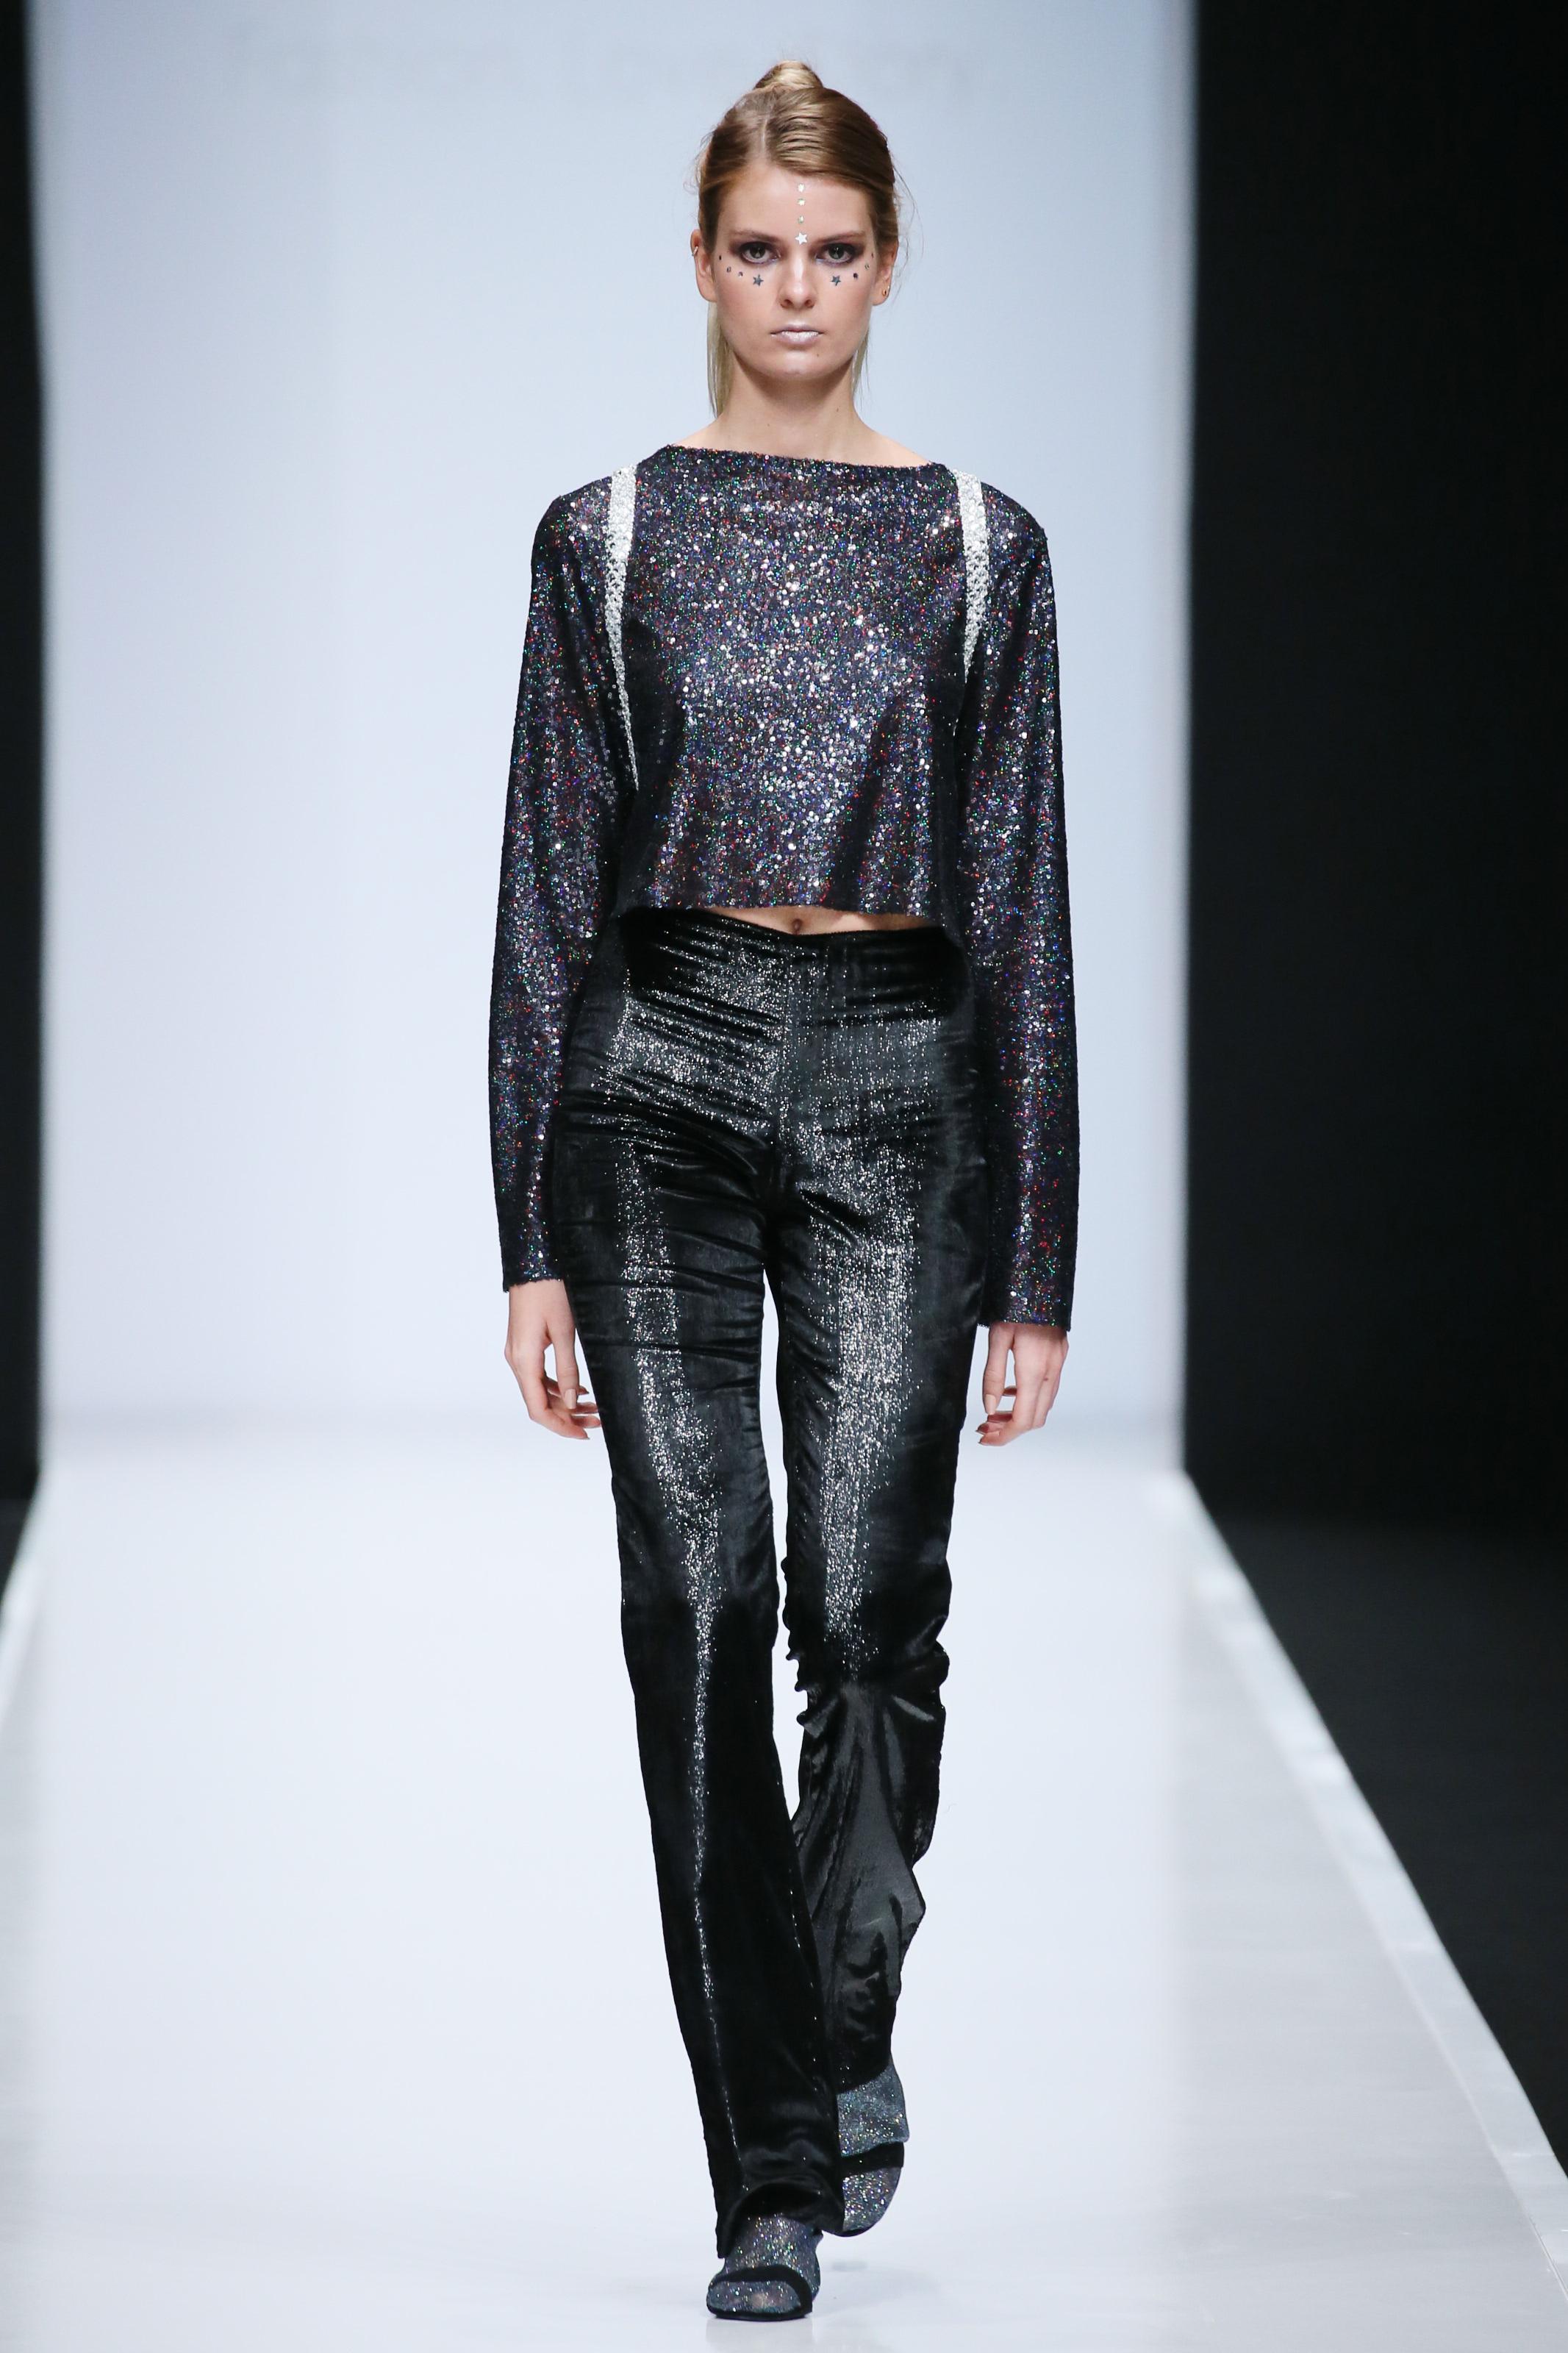 Фото: MBFWRussia: показ FashionTime Designers 2019